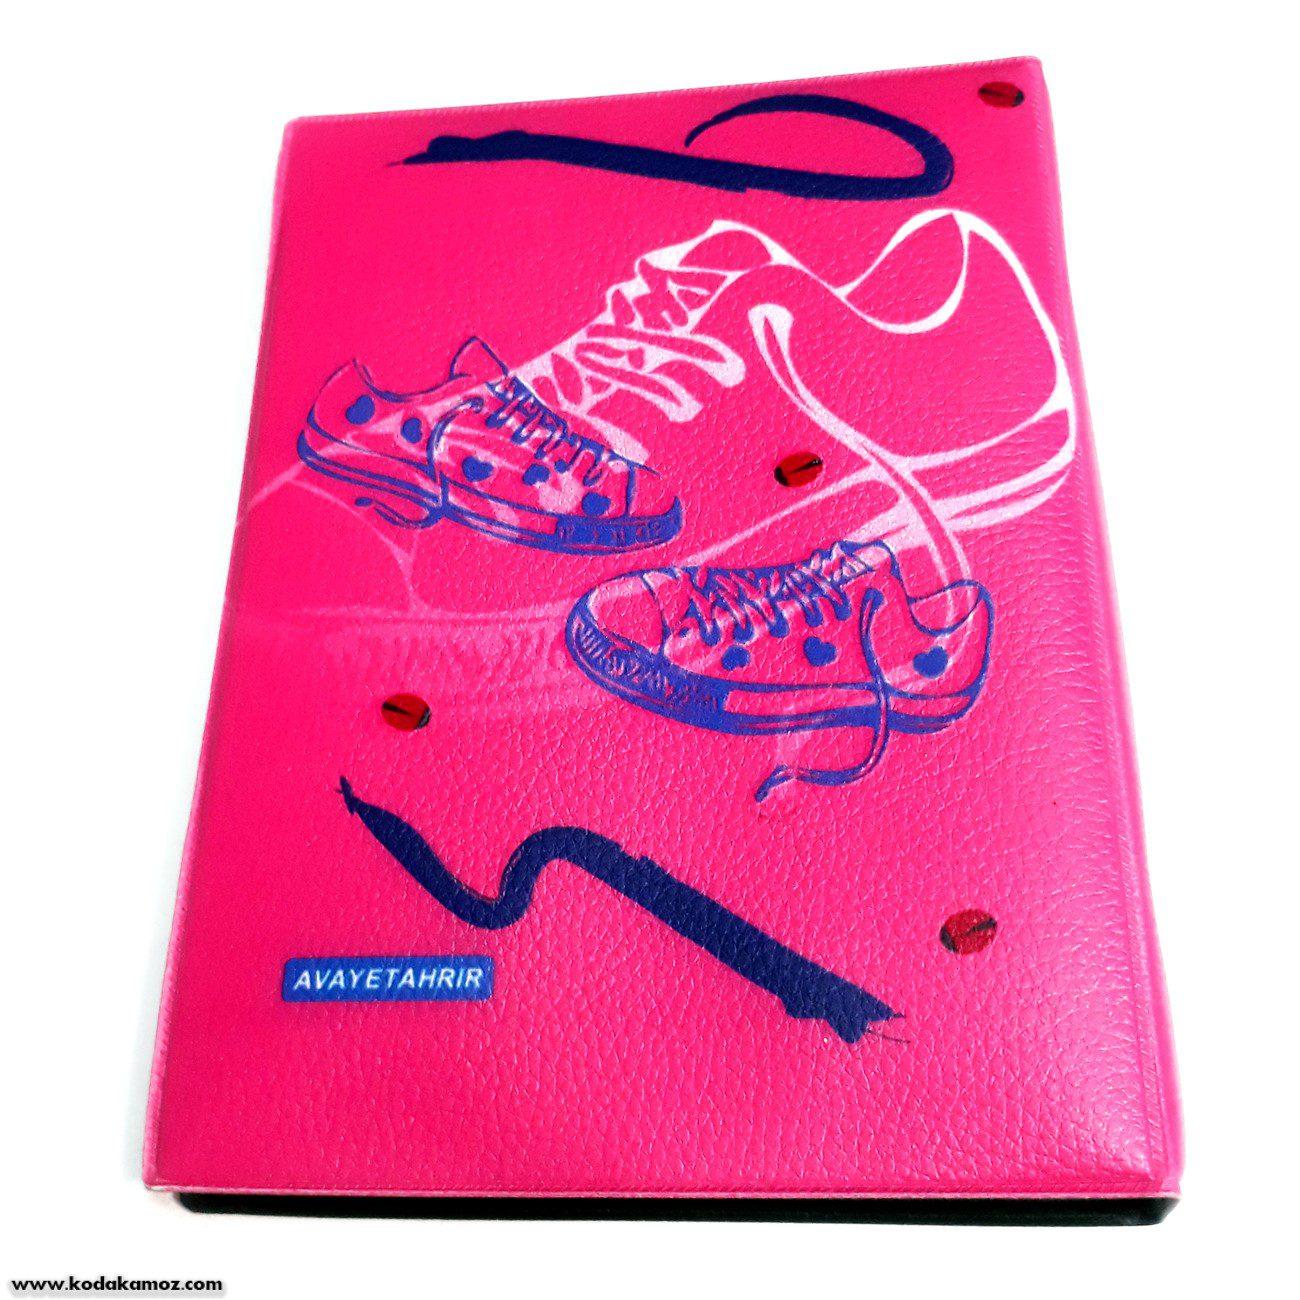 یادداشت کلاسوری 6 حلقه65255 طرح کفش